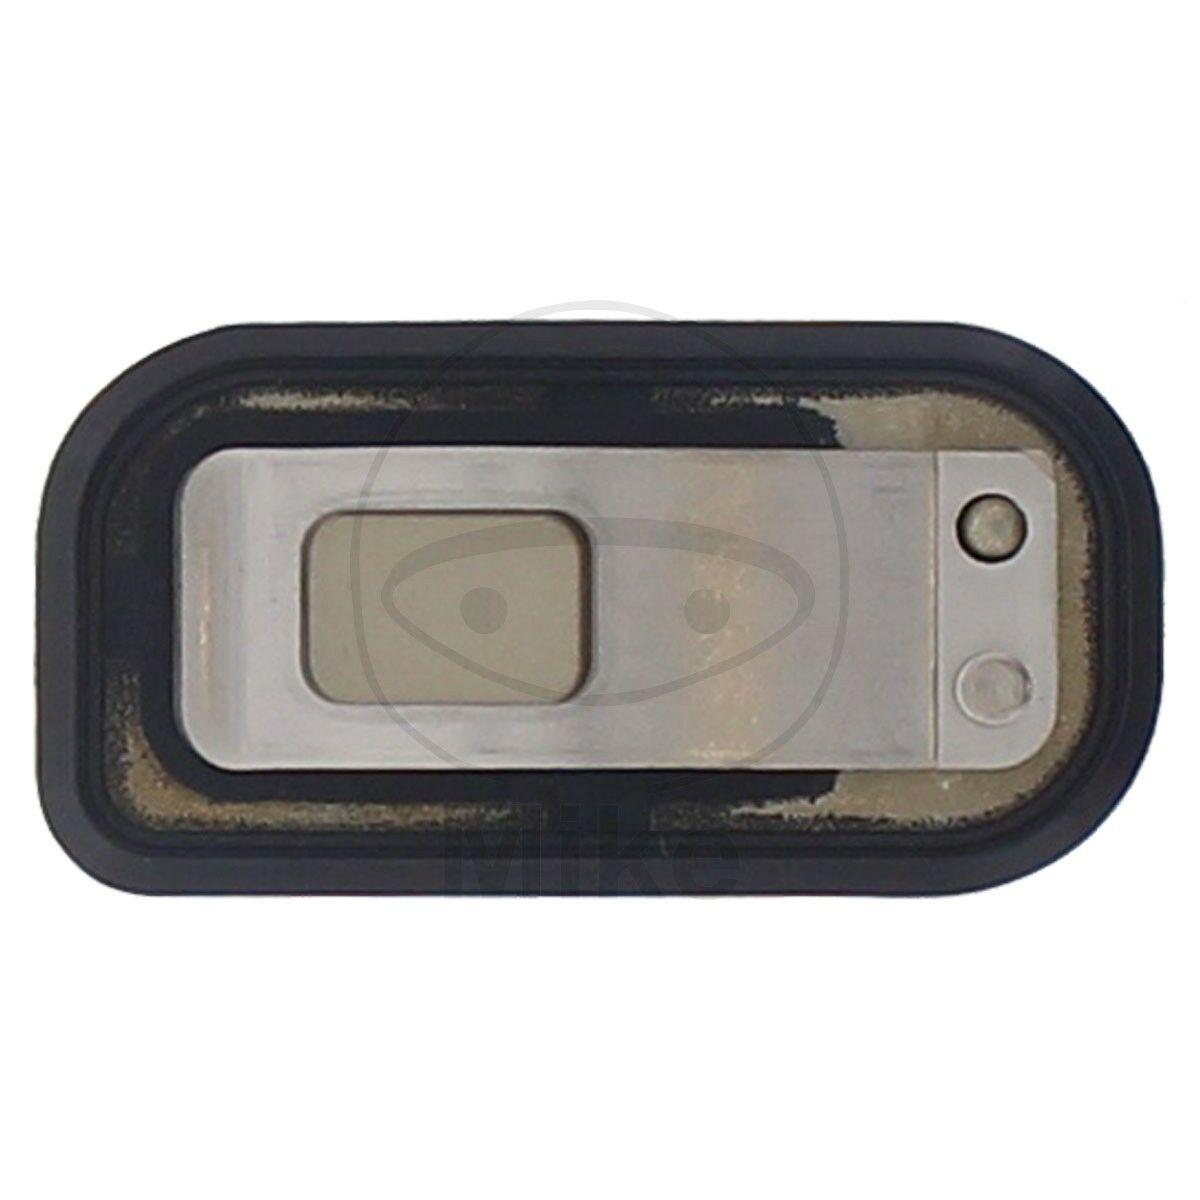 Obrázek produktu Blok s klapkami sání TOURMAX